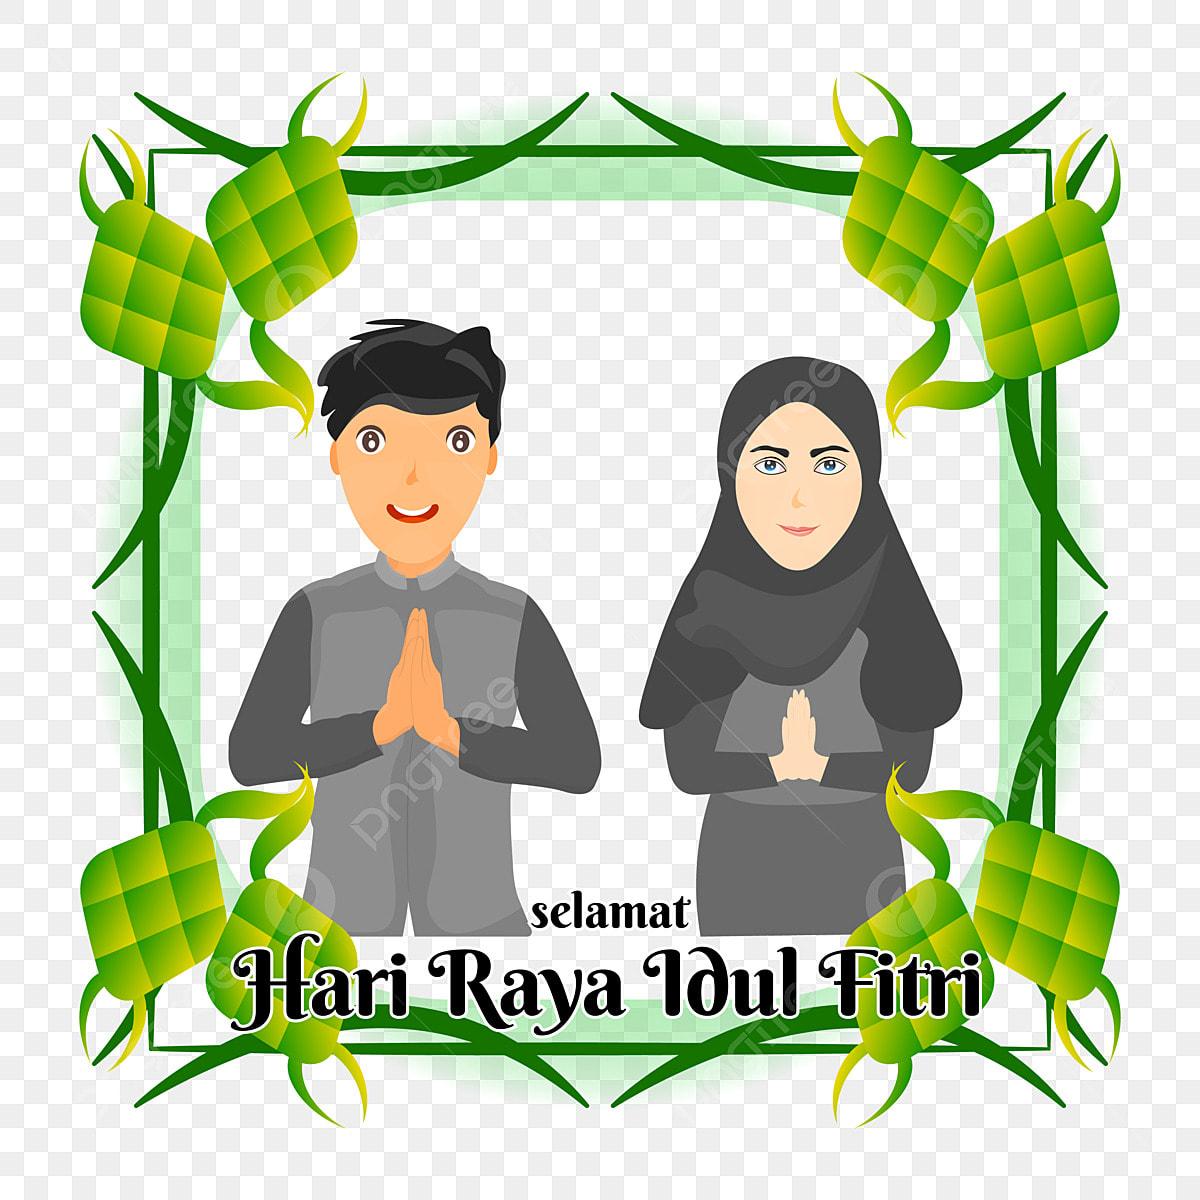 Cartoon Muslim Couple Say It Selamat Hari Raya Idul Fitri Happy Eid Mubarak Idul Fitri Eid Fitri Eid Png And Vector With Transparent Background For Free Download